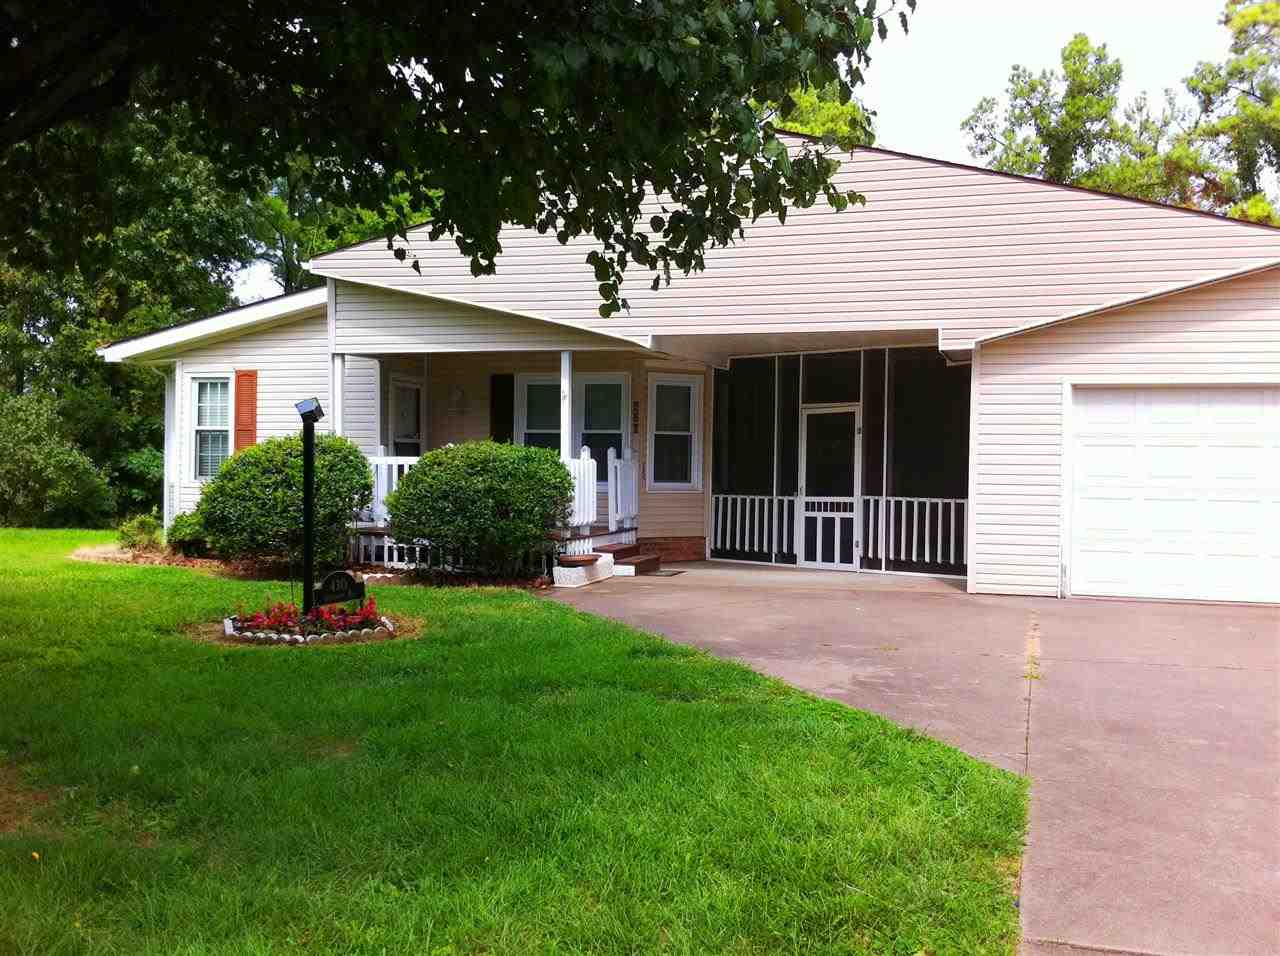 Real Estate for Sale, ListingId: 28473166, Eddyville,KY42038